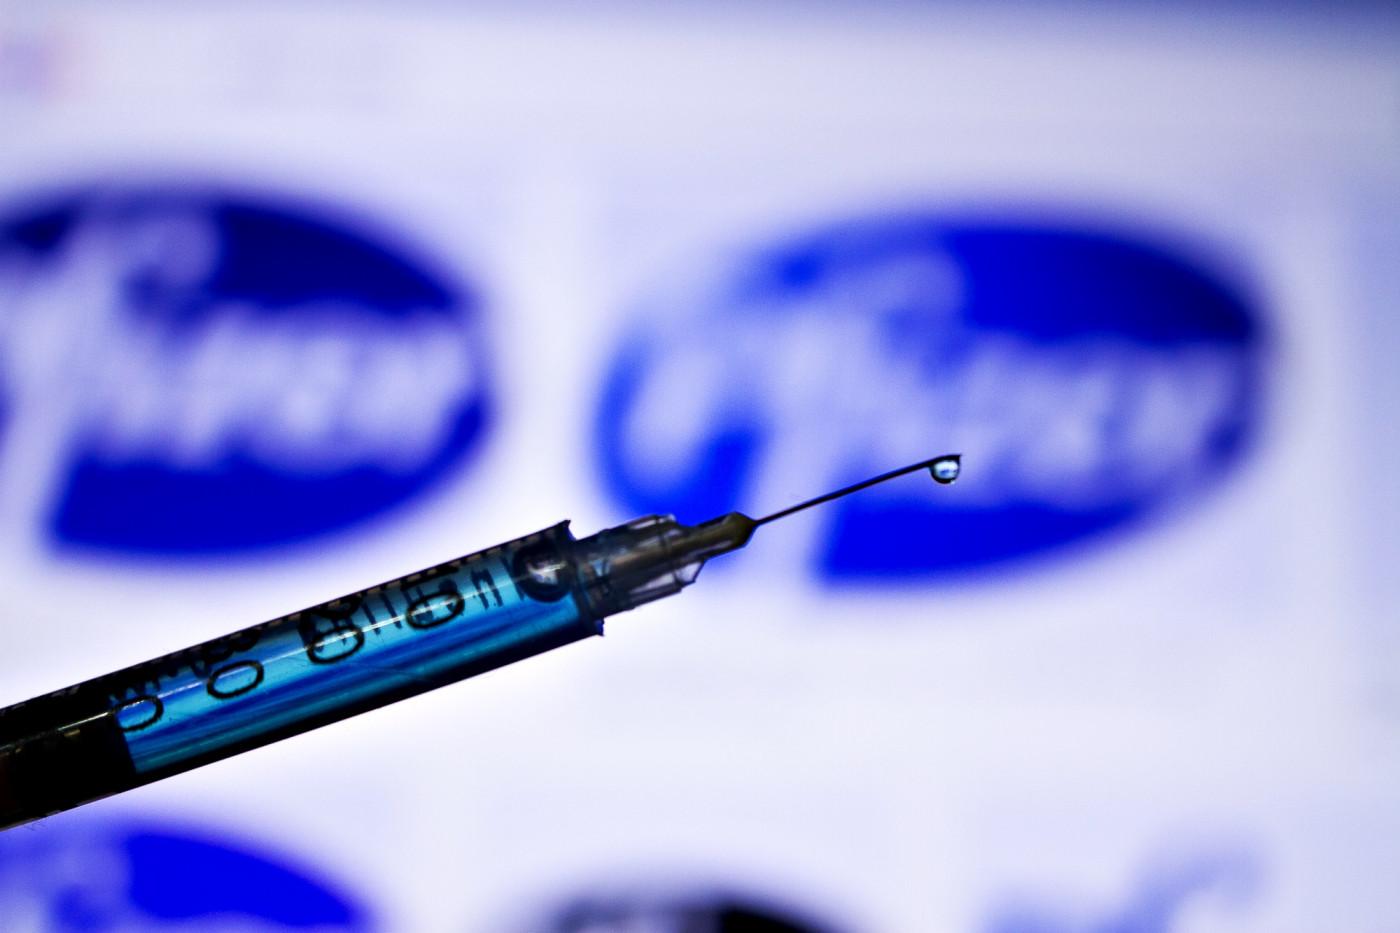 Vacina da Pfizer contra a Covid-19